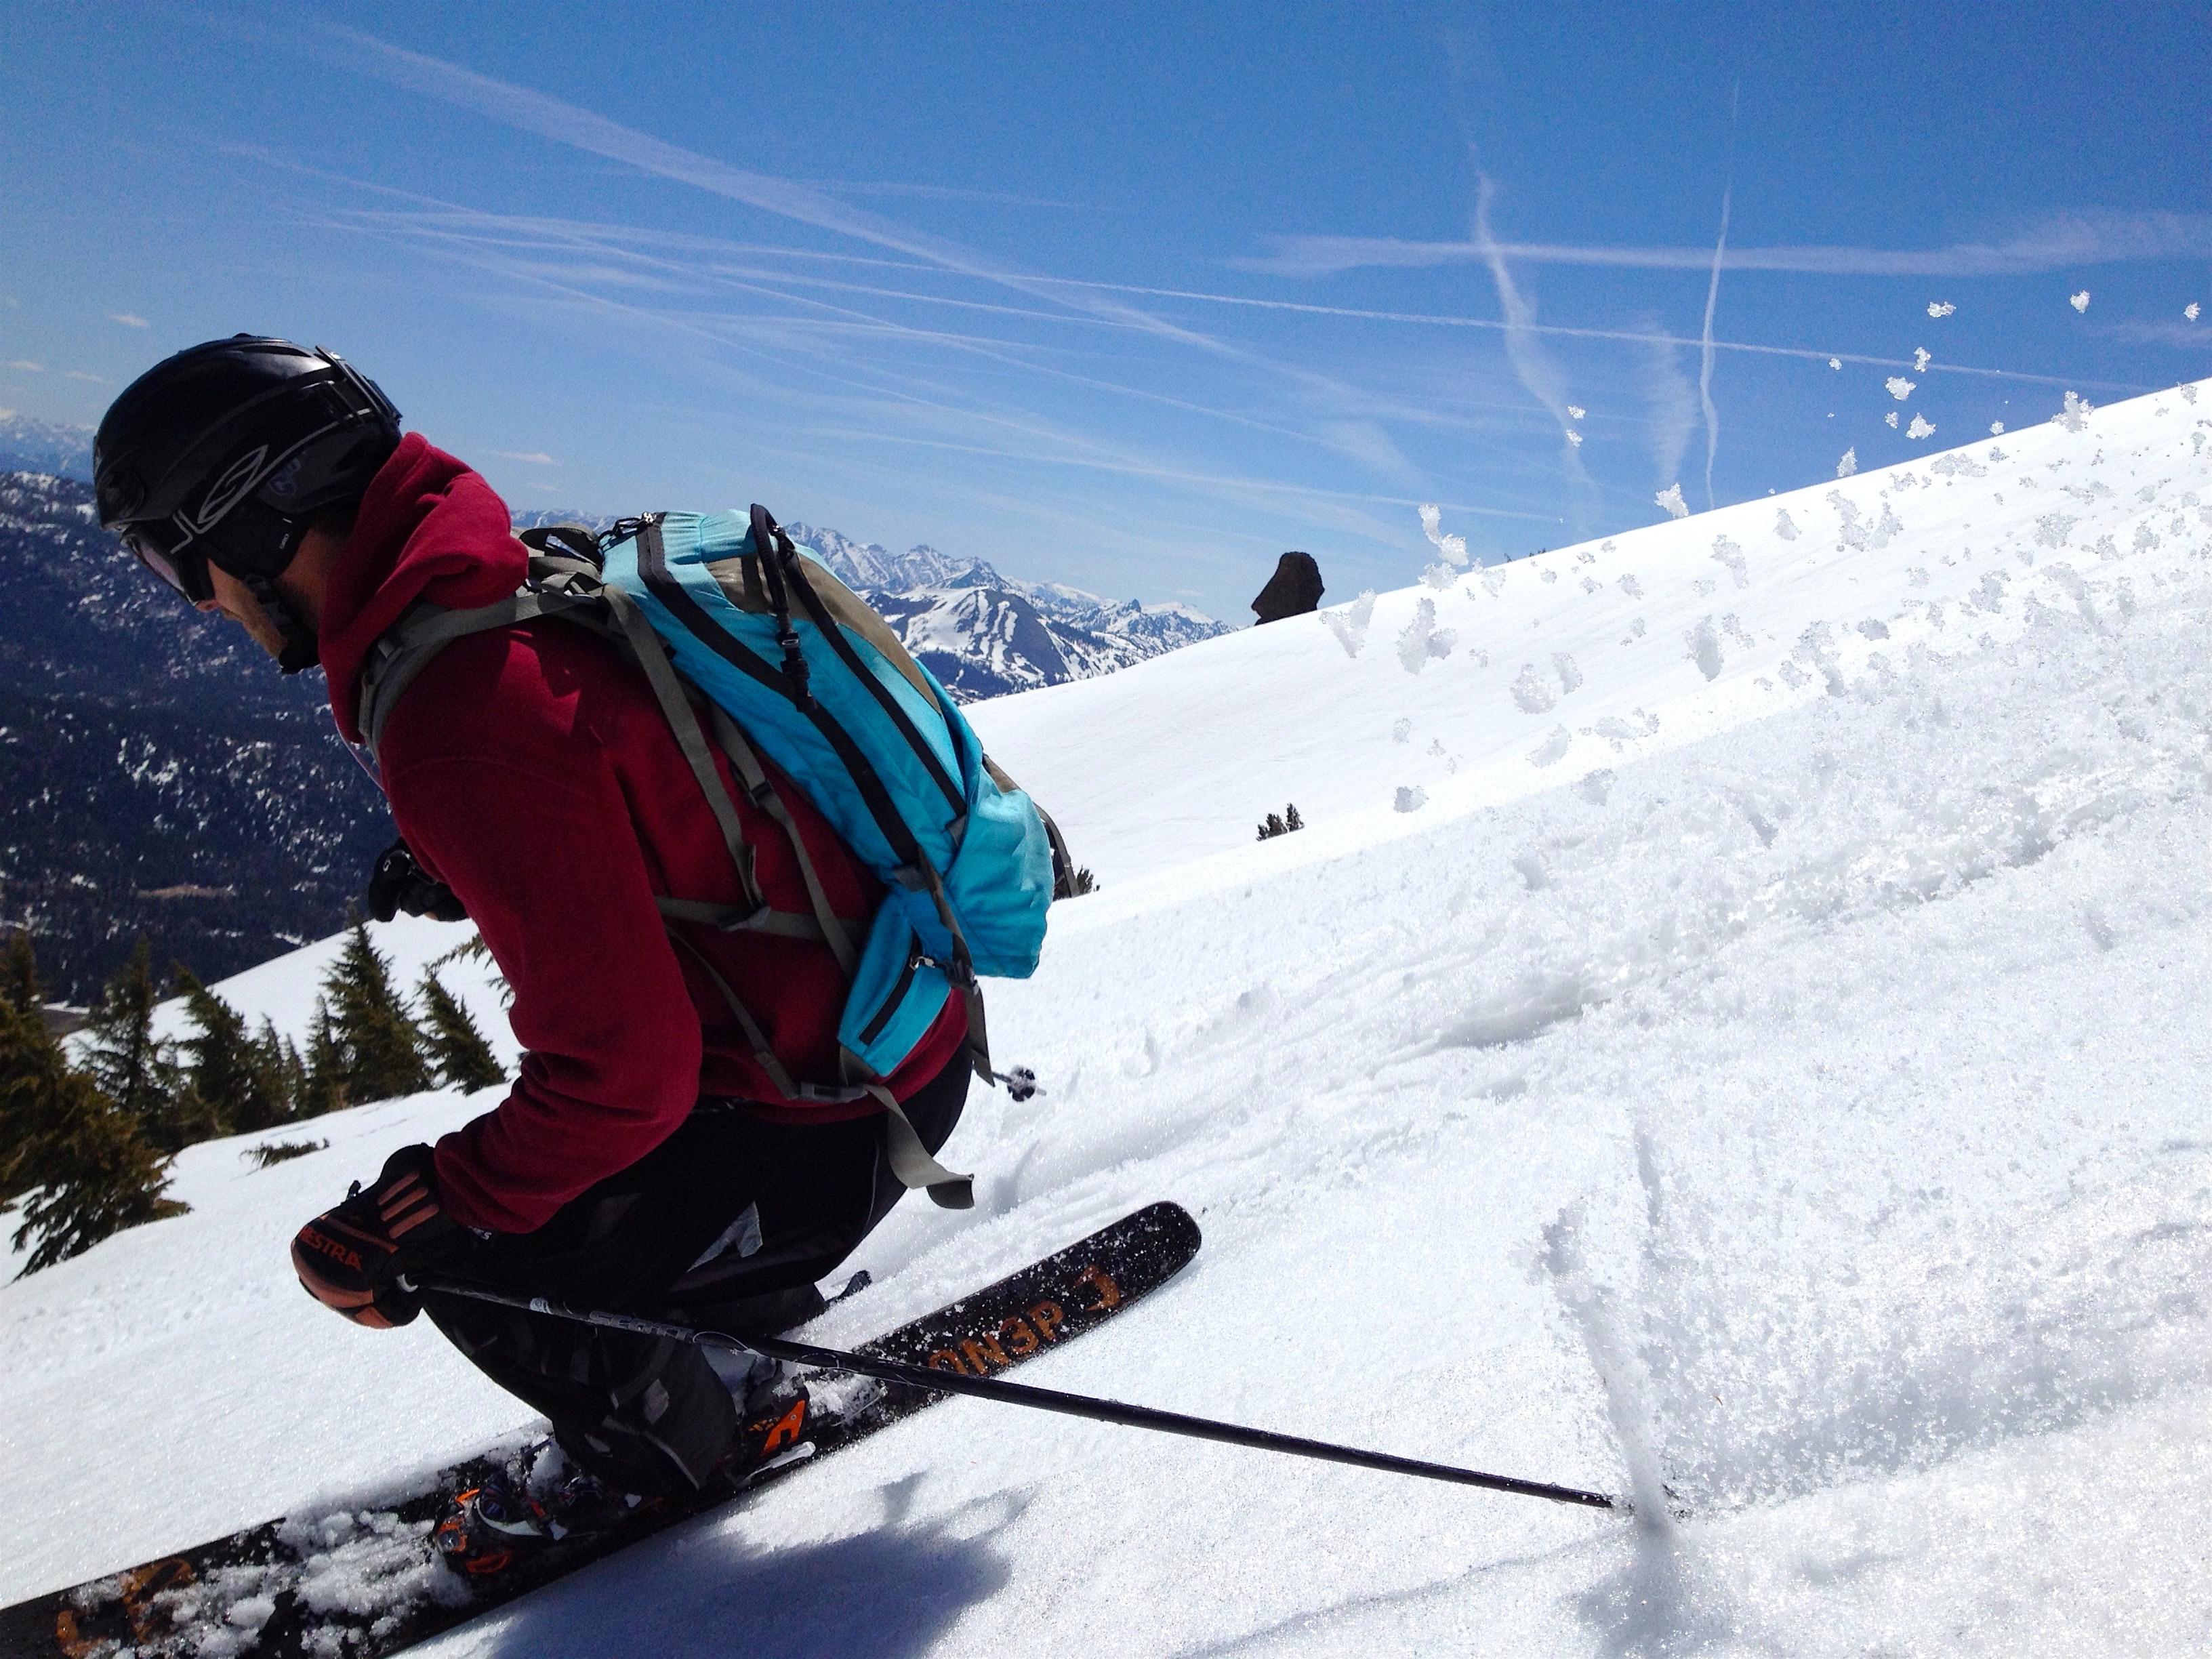 Rick slush spray today. photo: miles clark/snowbrains